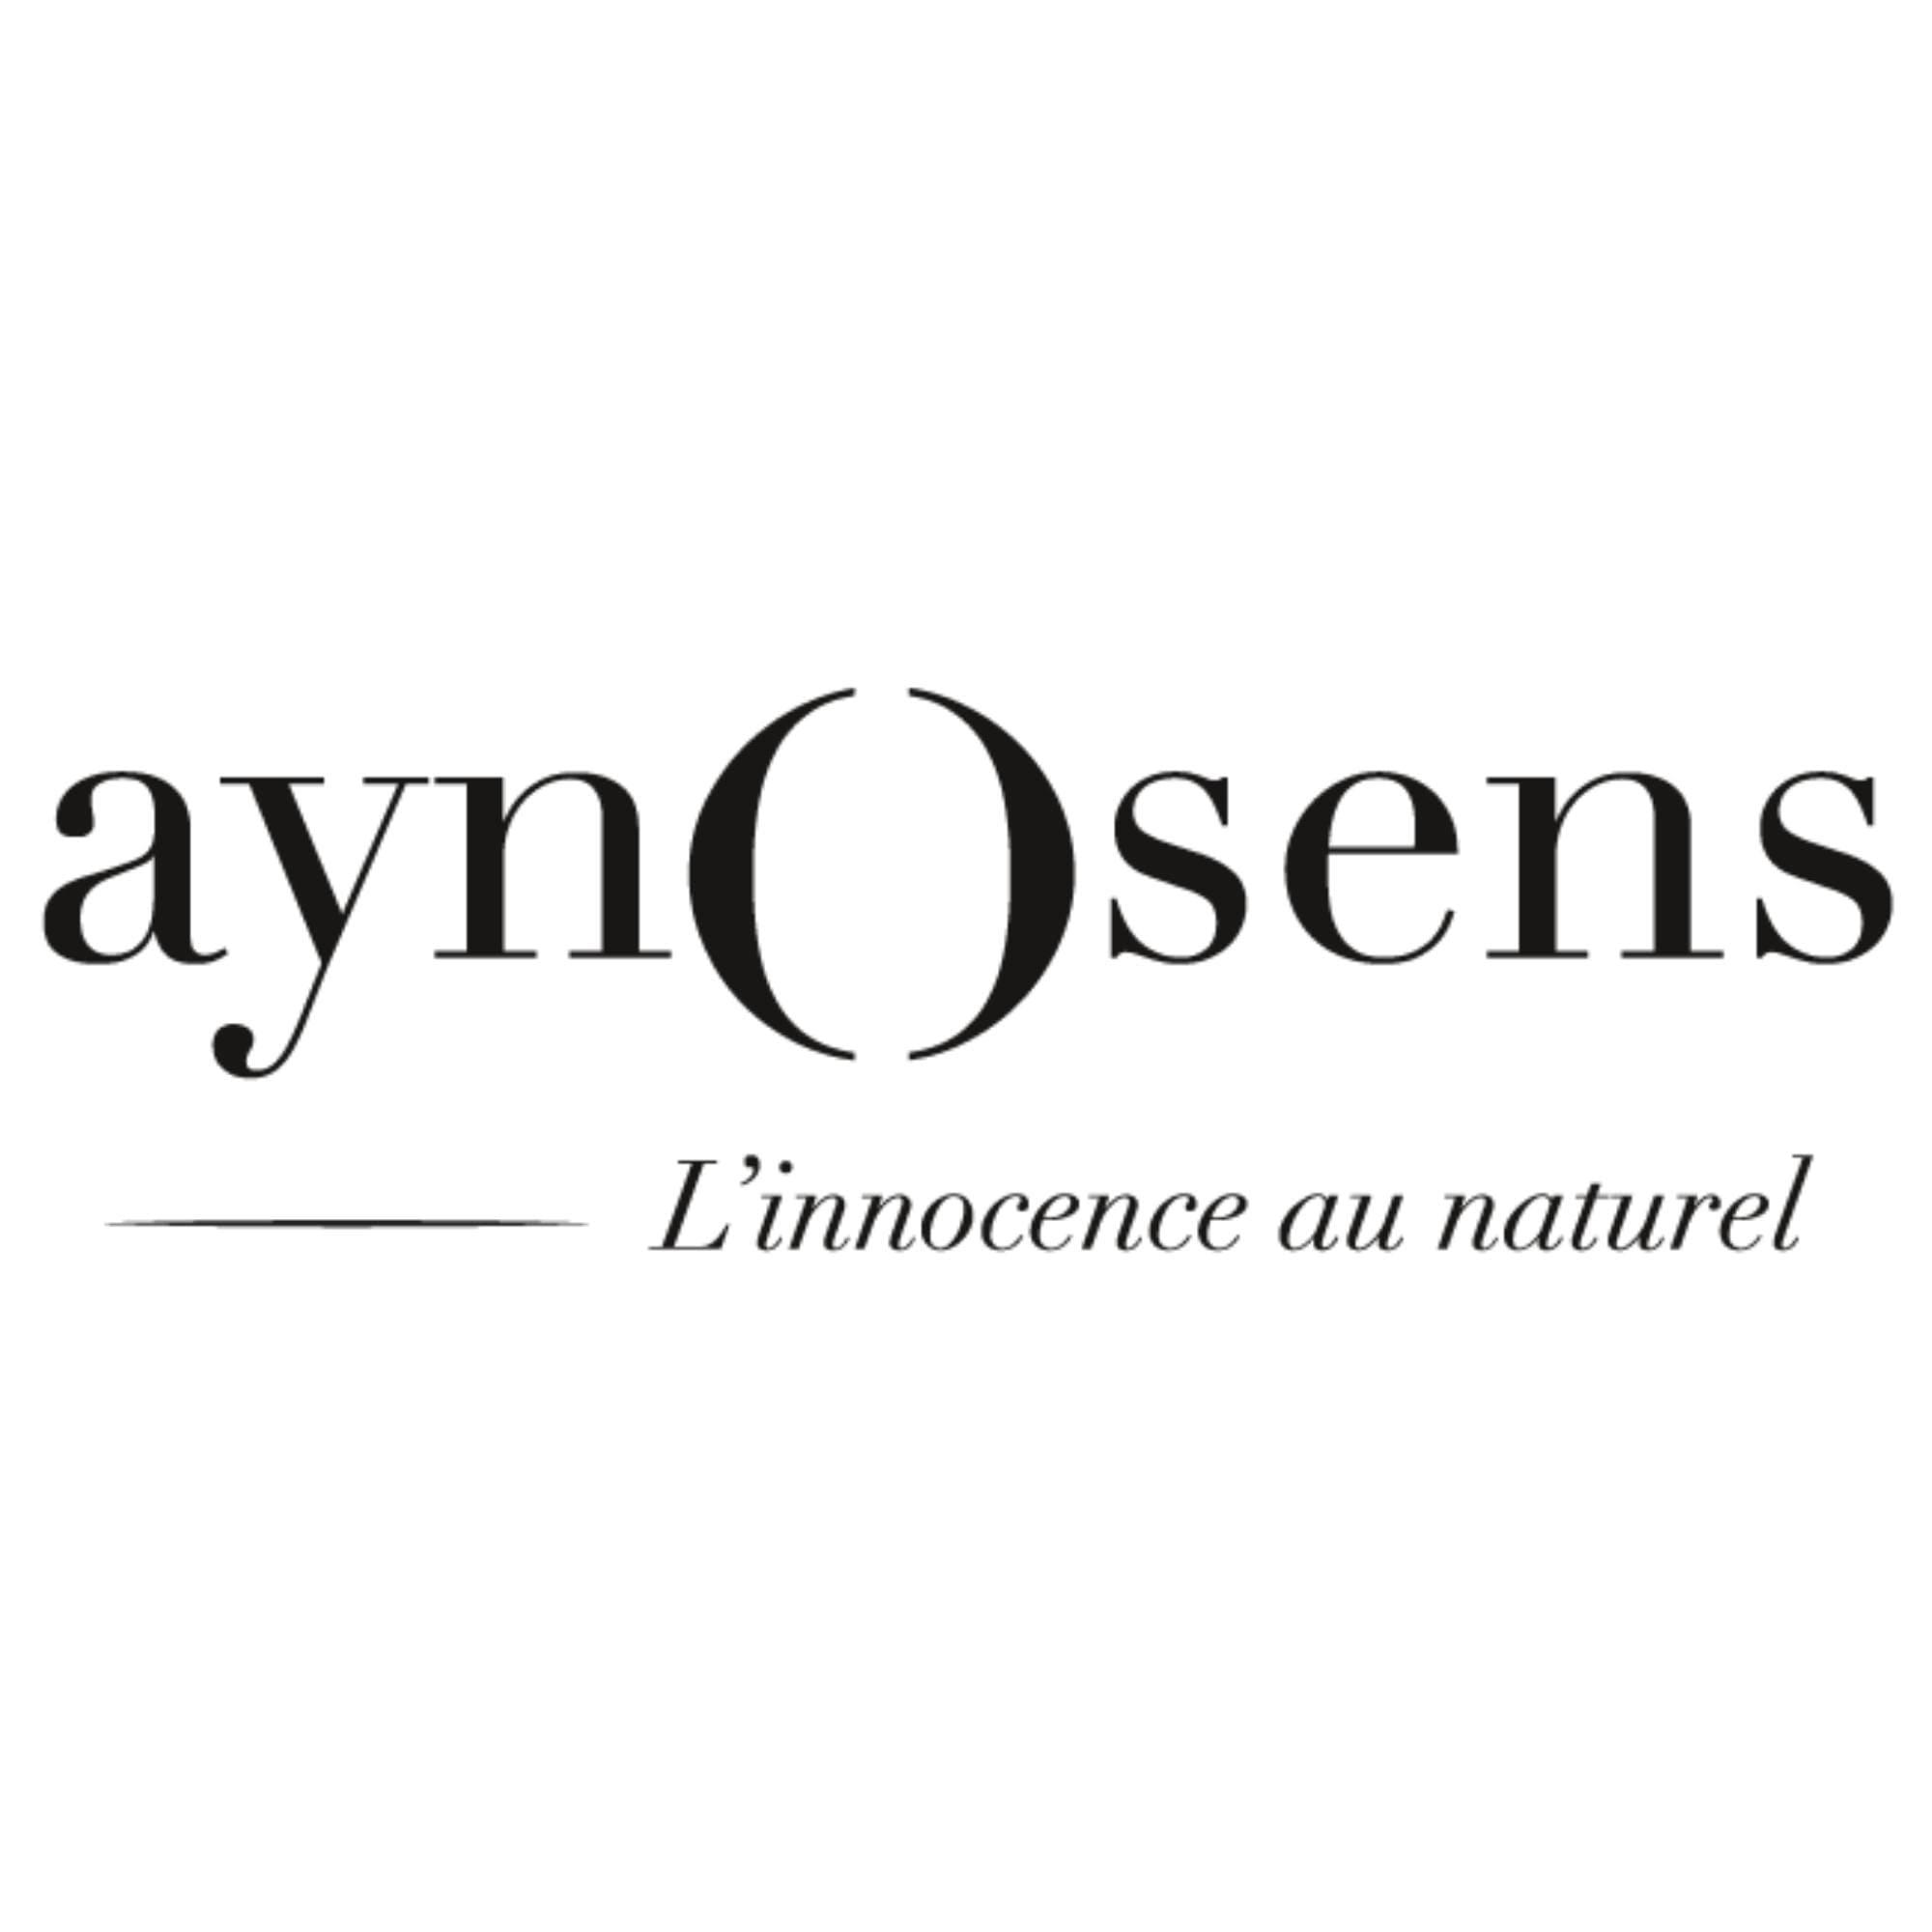 AYNOSENS